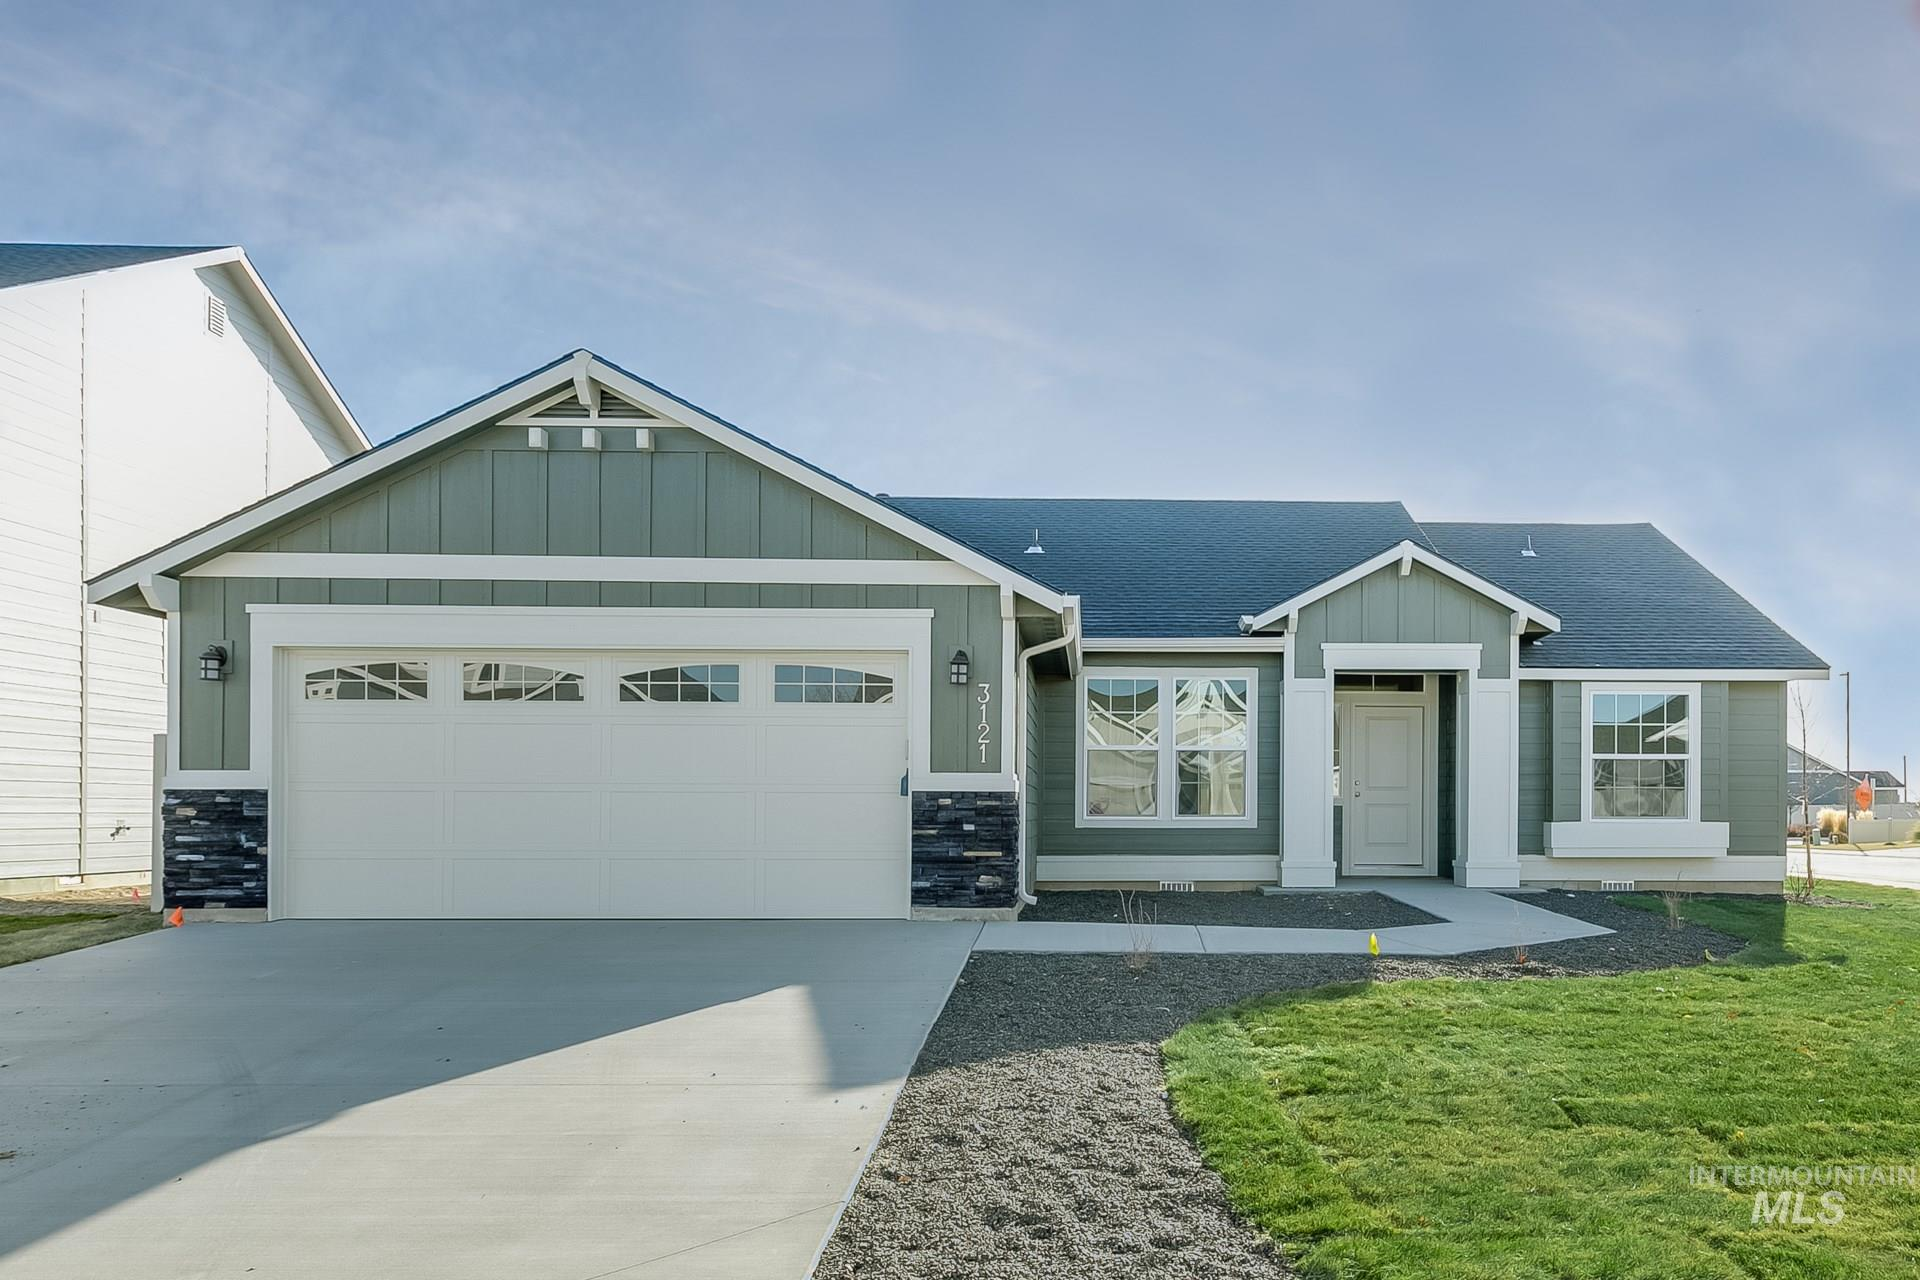 2780 N Iditarod Way Property Photo - Kuna, ID real estate listing